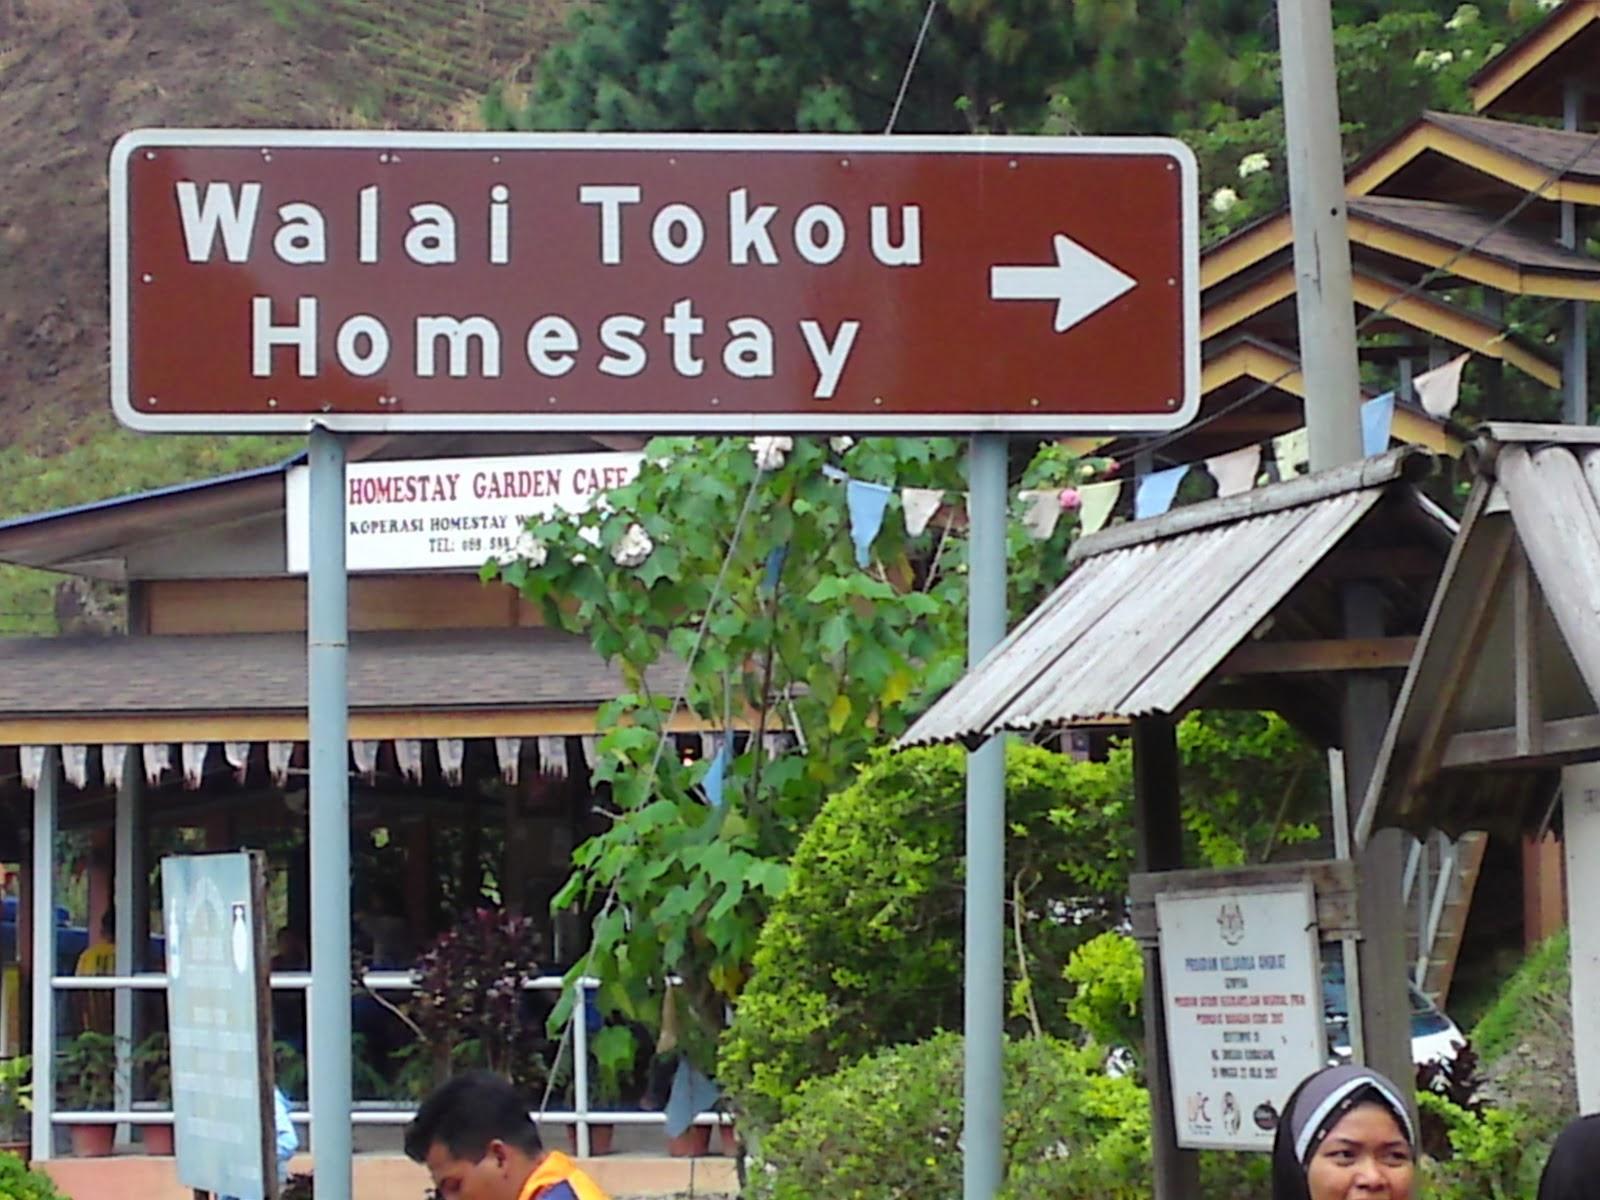 HOMESTAY IN MALAYSIA Inap Desa 2013